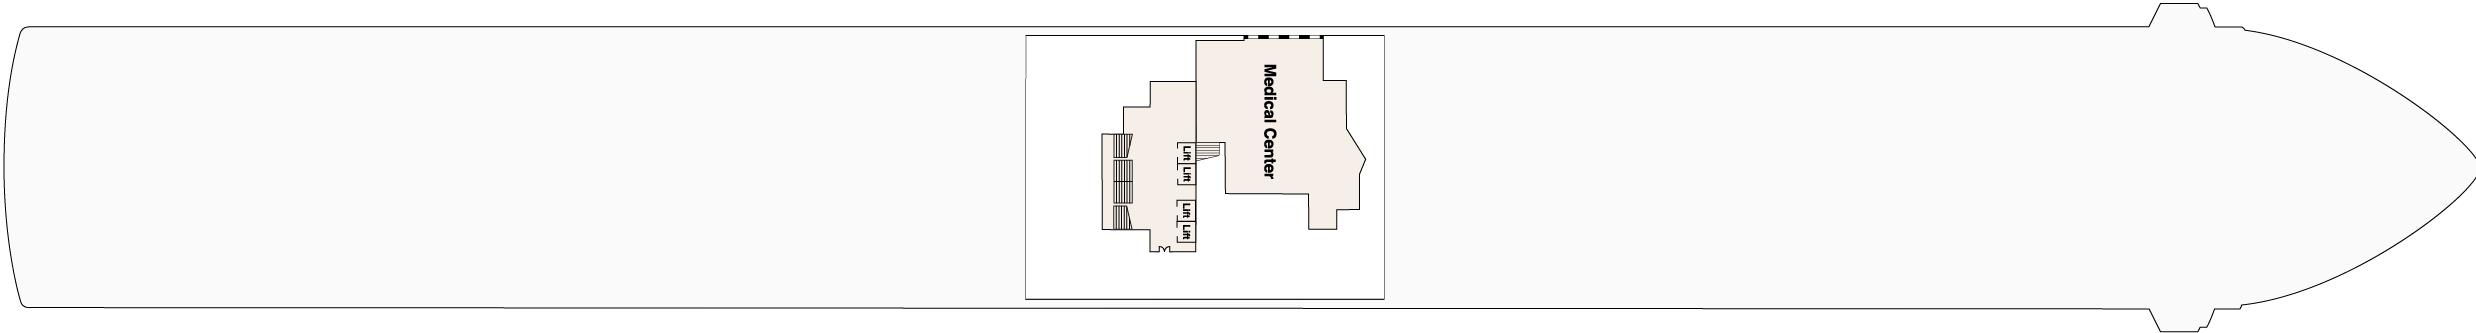 Deck 4 – Gala